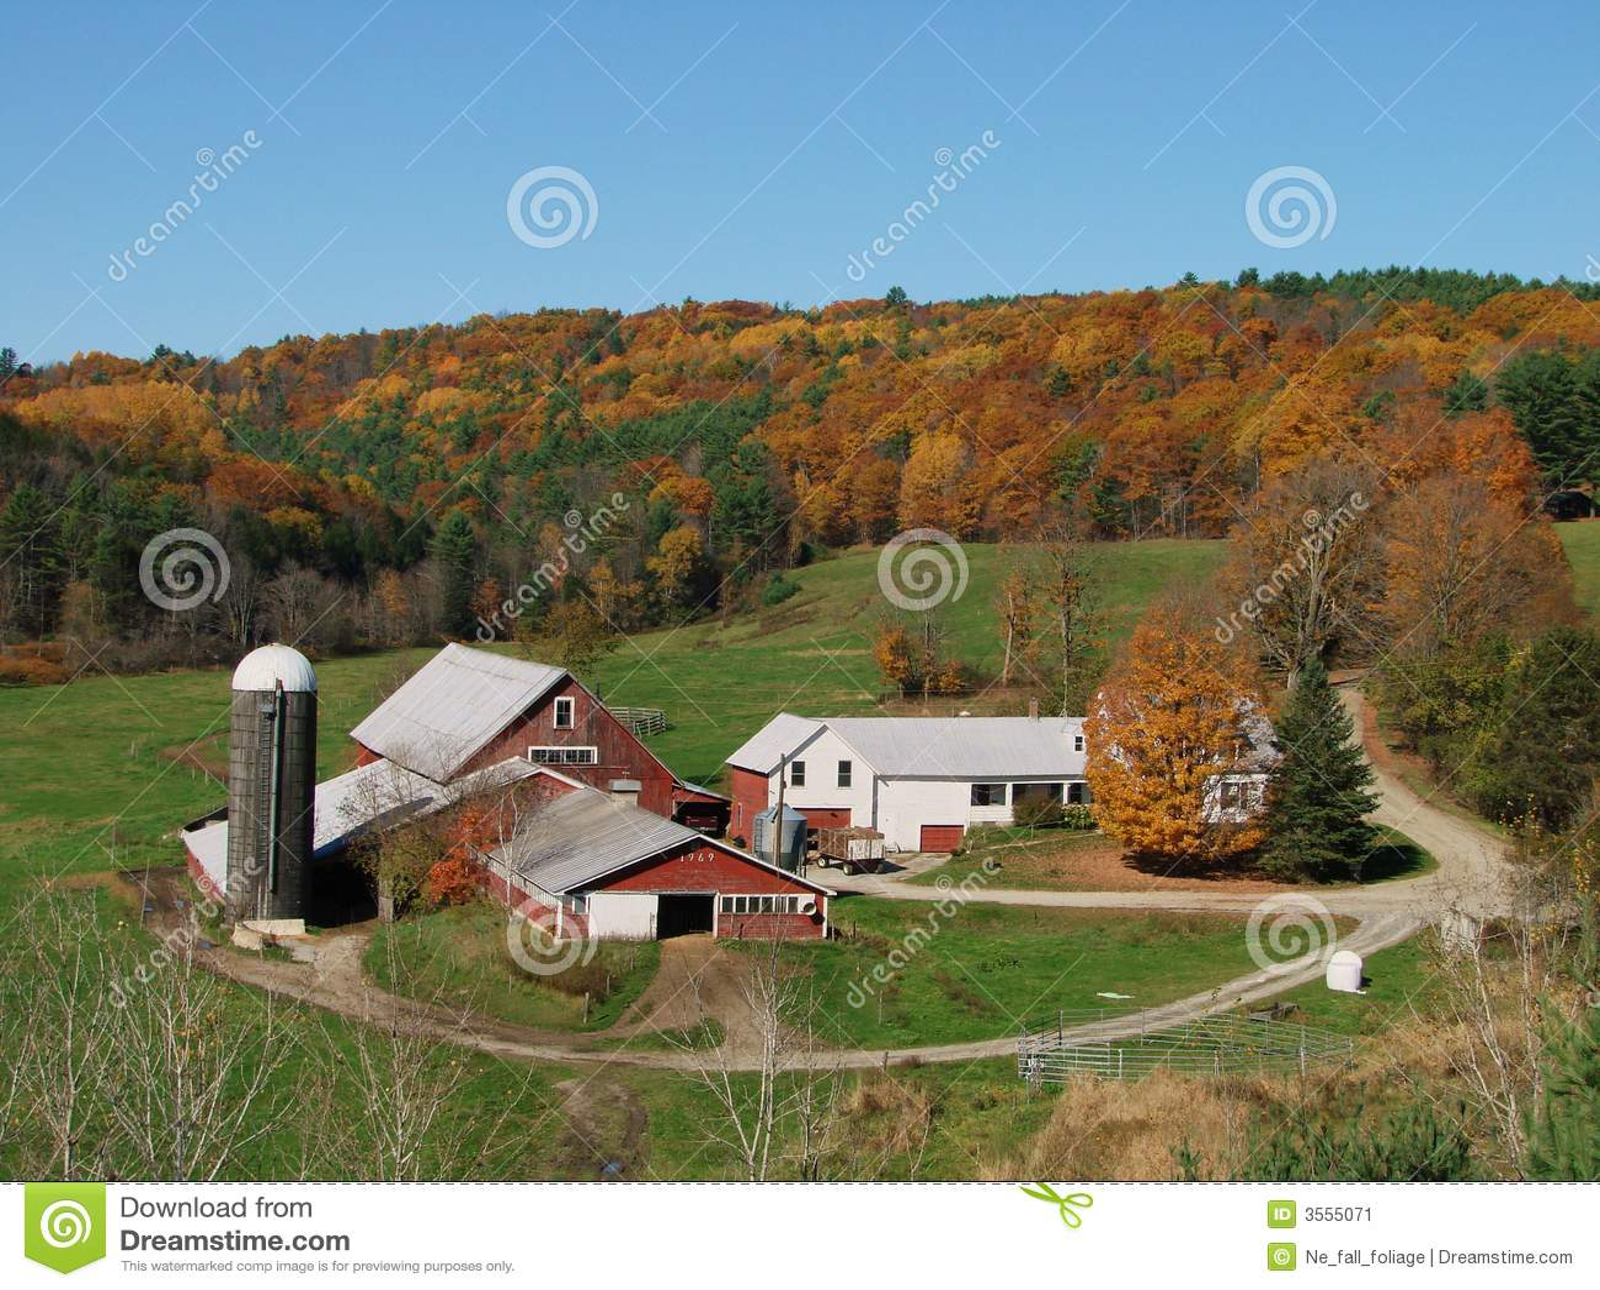 vermont dairy farm stock image   image 3555071